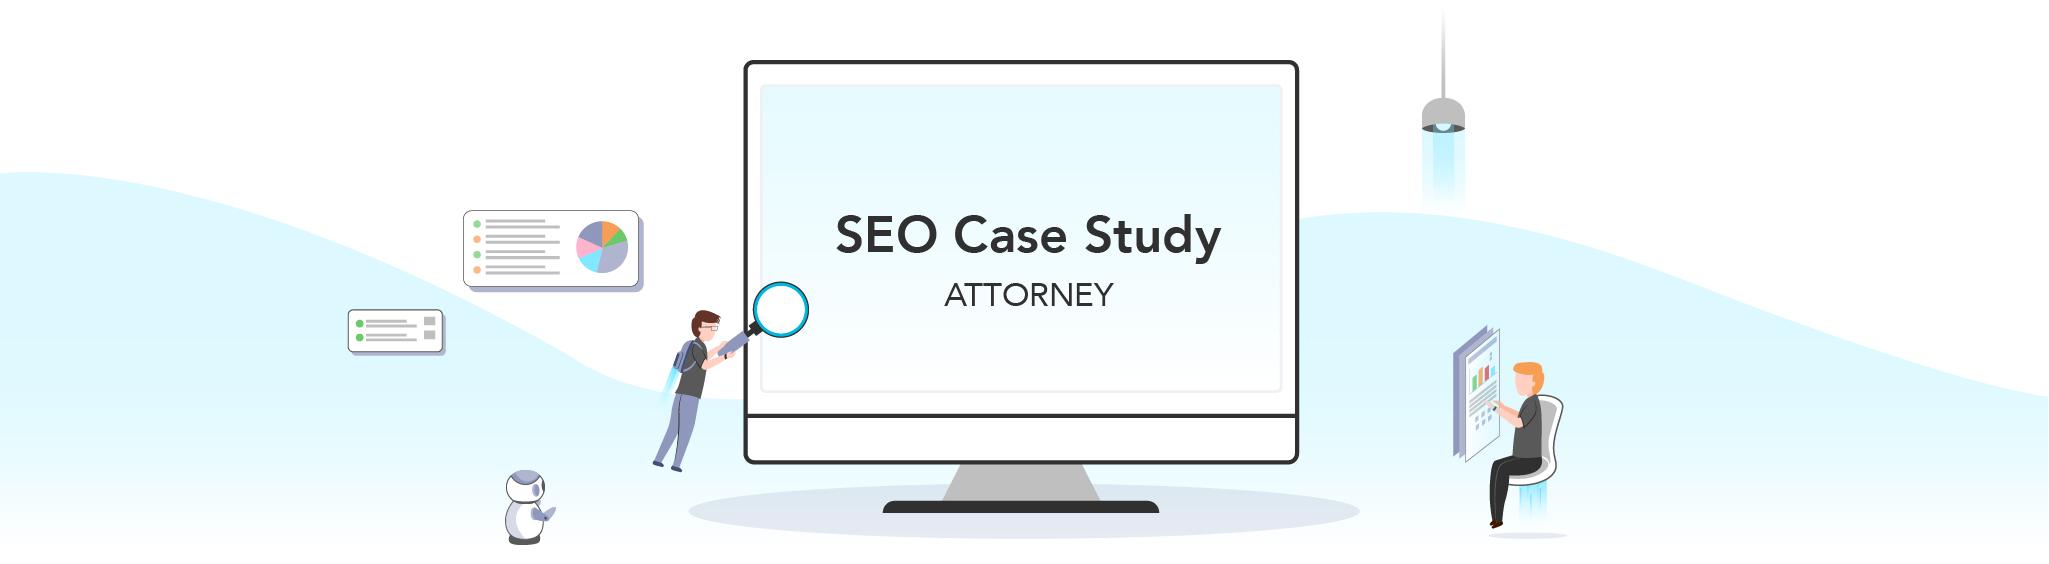 Attorney SEO Case Study